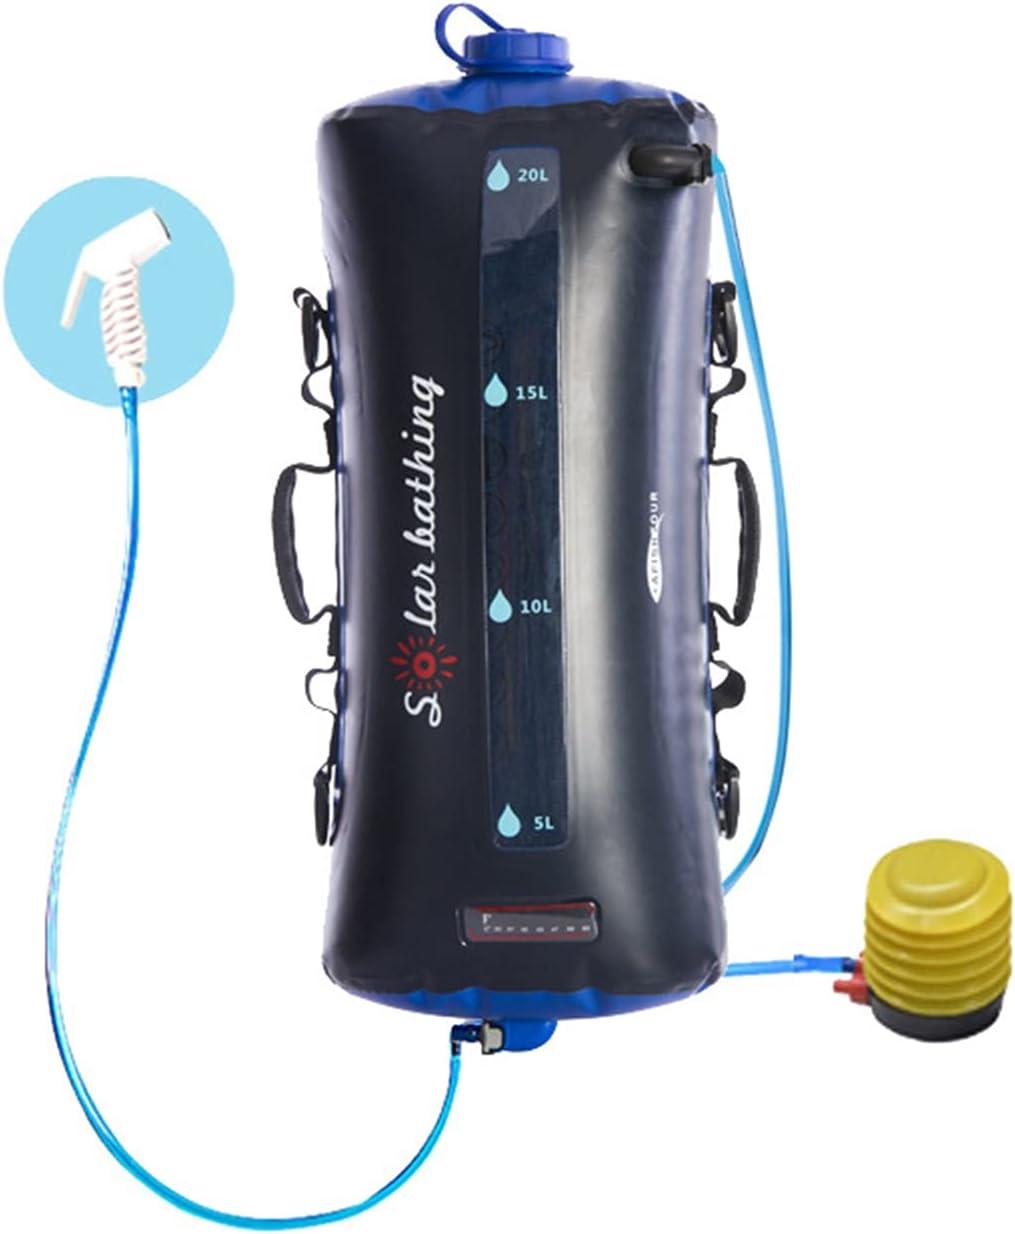 Solar Shower Bag Hua Portable Outdoor 20L Be super welcome Finally popular brand Show